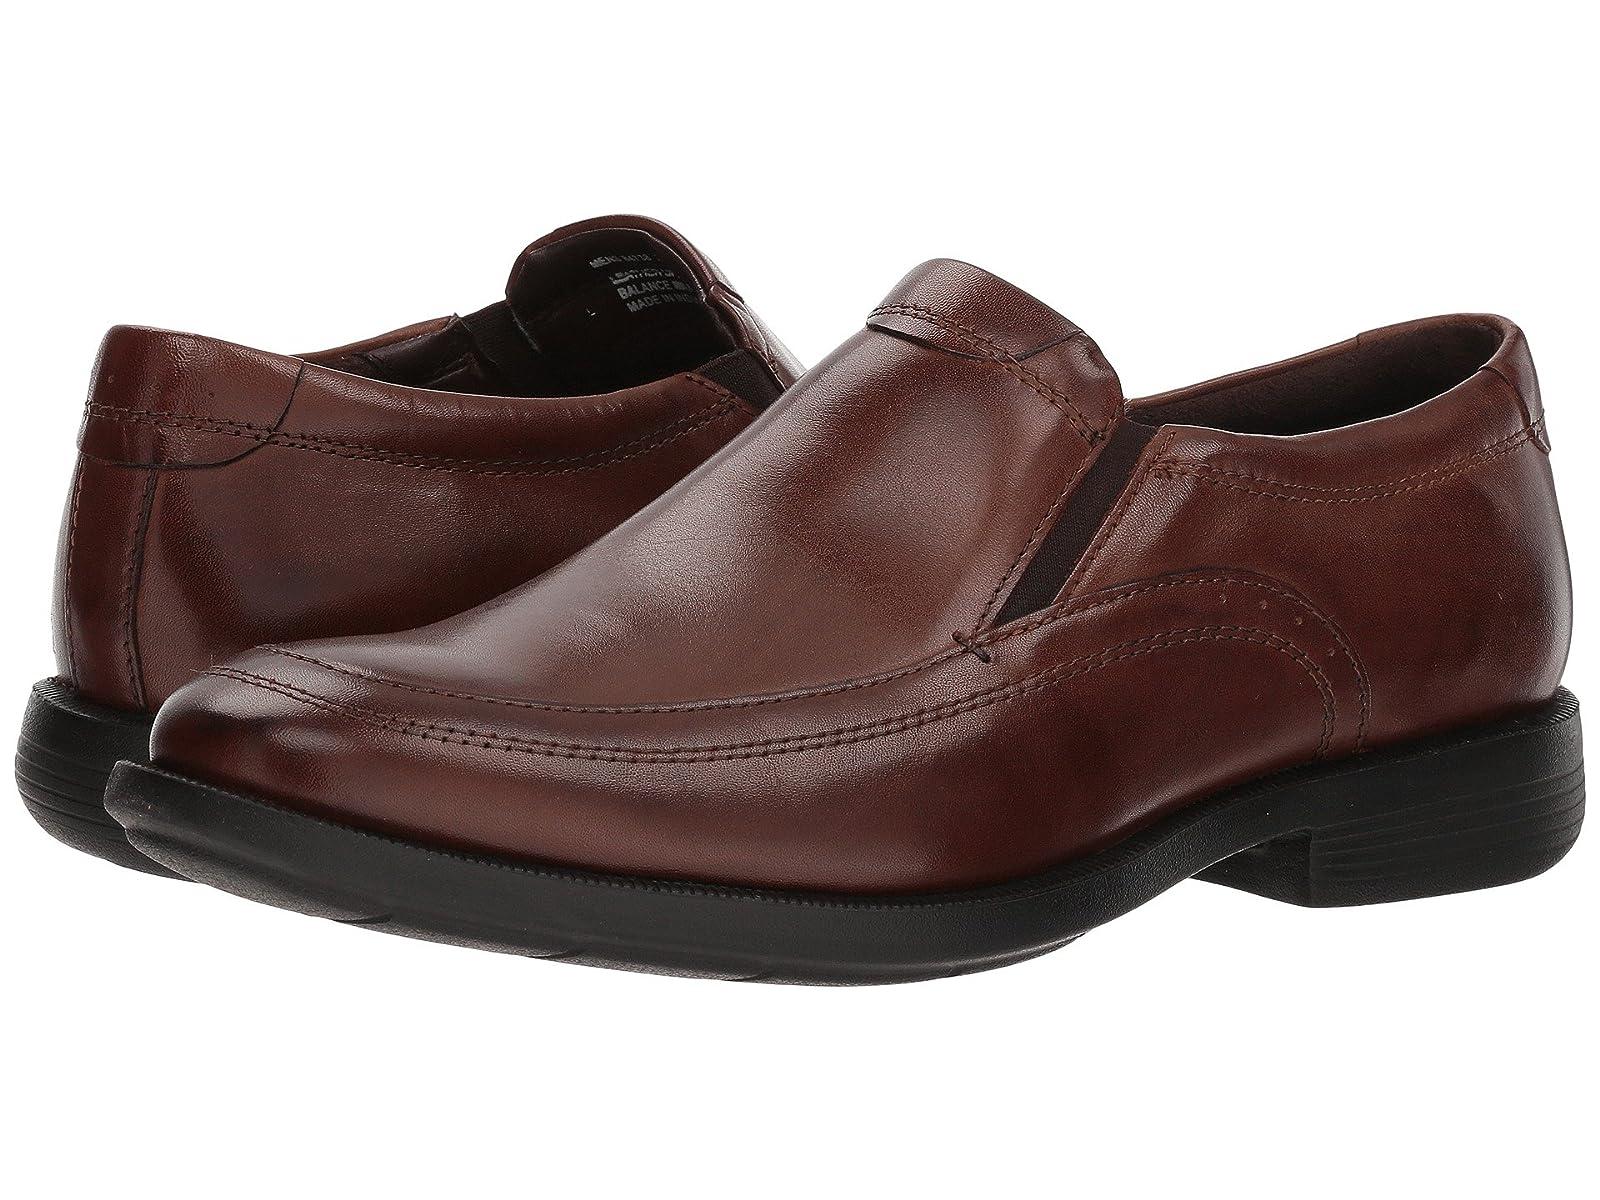 Nunn Bush Dylan Moc Toe Loafer with KORE Walking Comfort TechnologyAtmospheric grades have affordable shoes